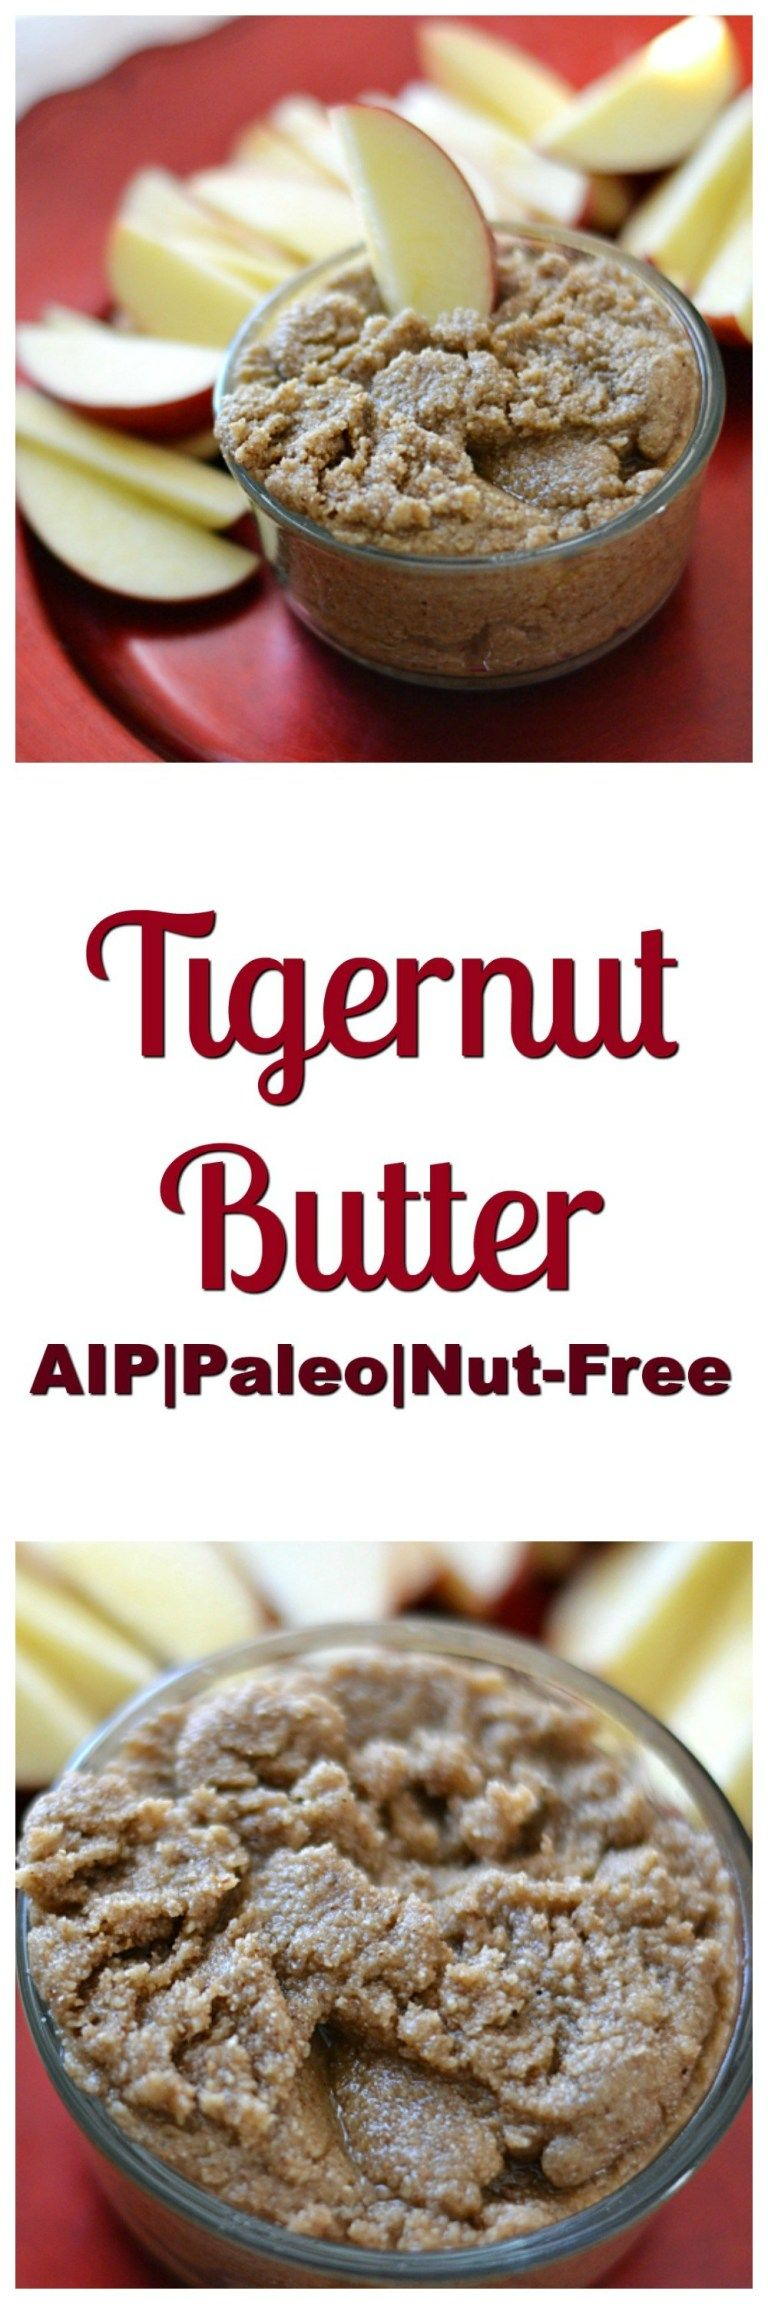 Tigernut Butter 2.0 (AIP/Paleo/Refined Sugar-Free